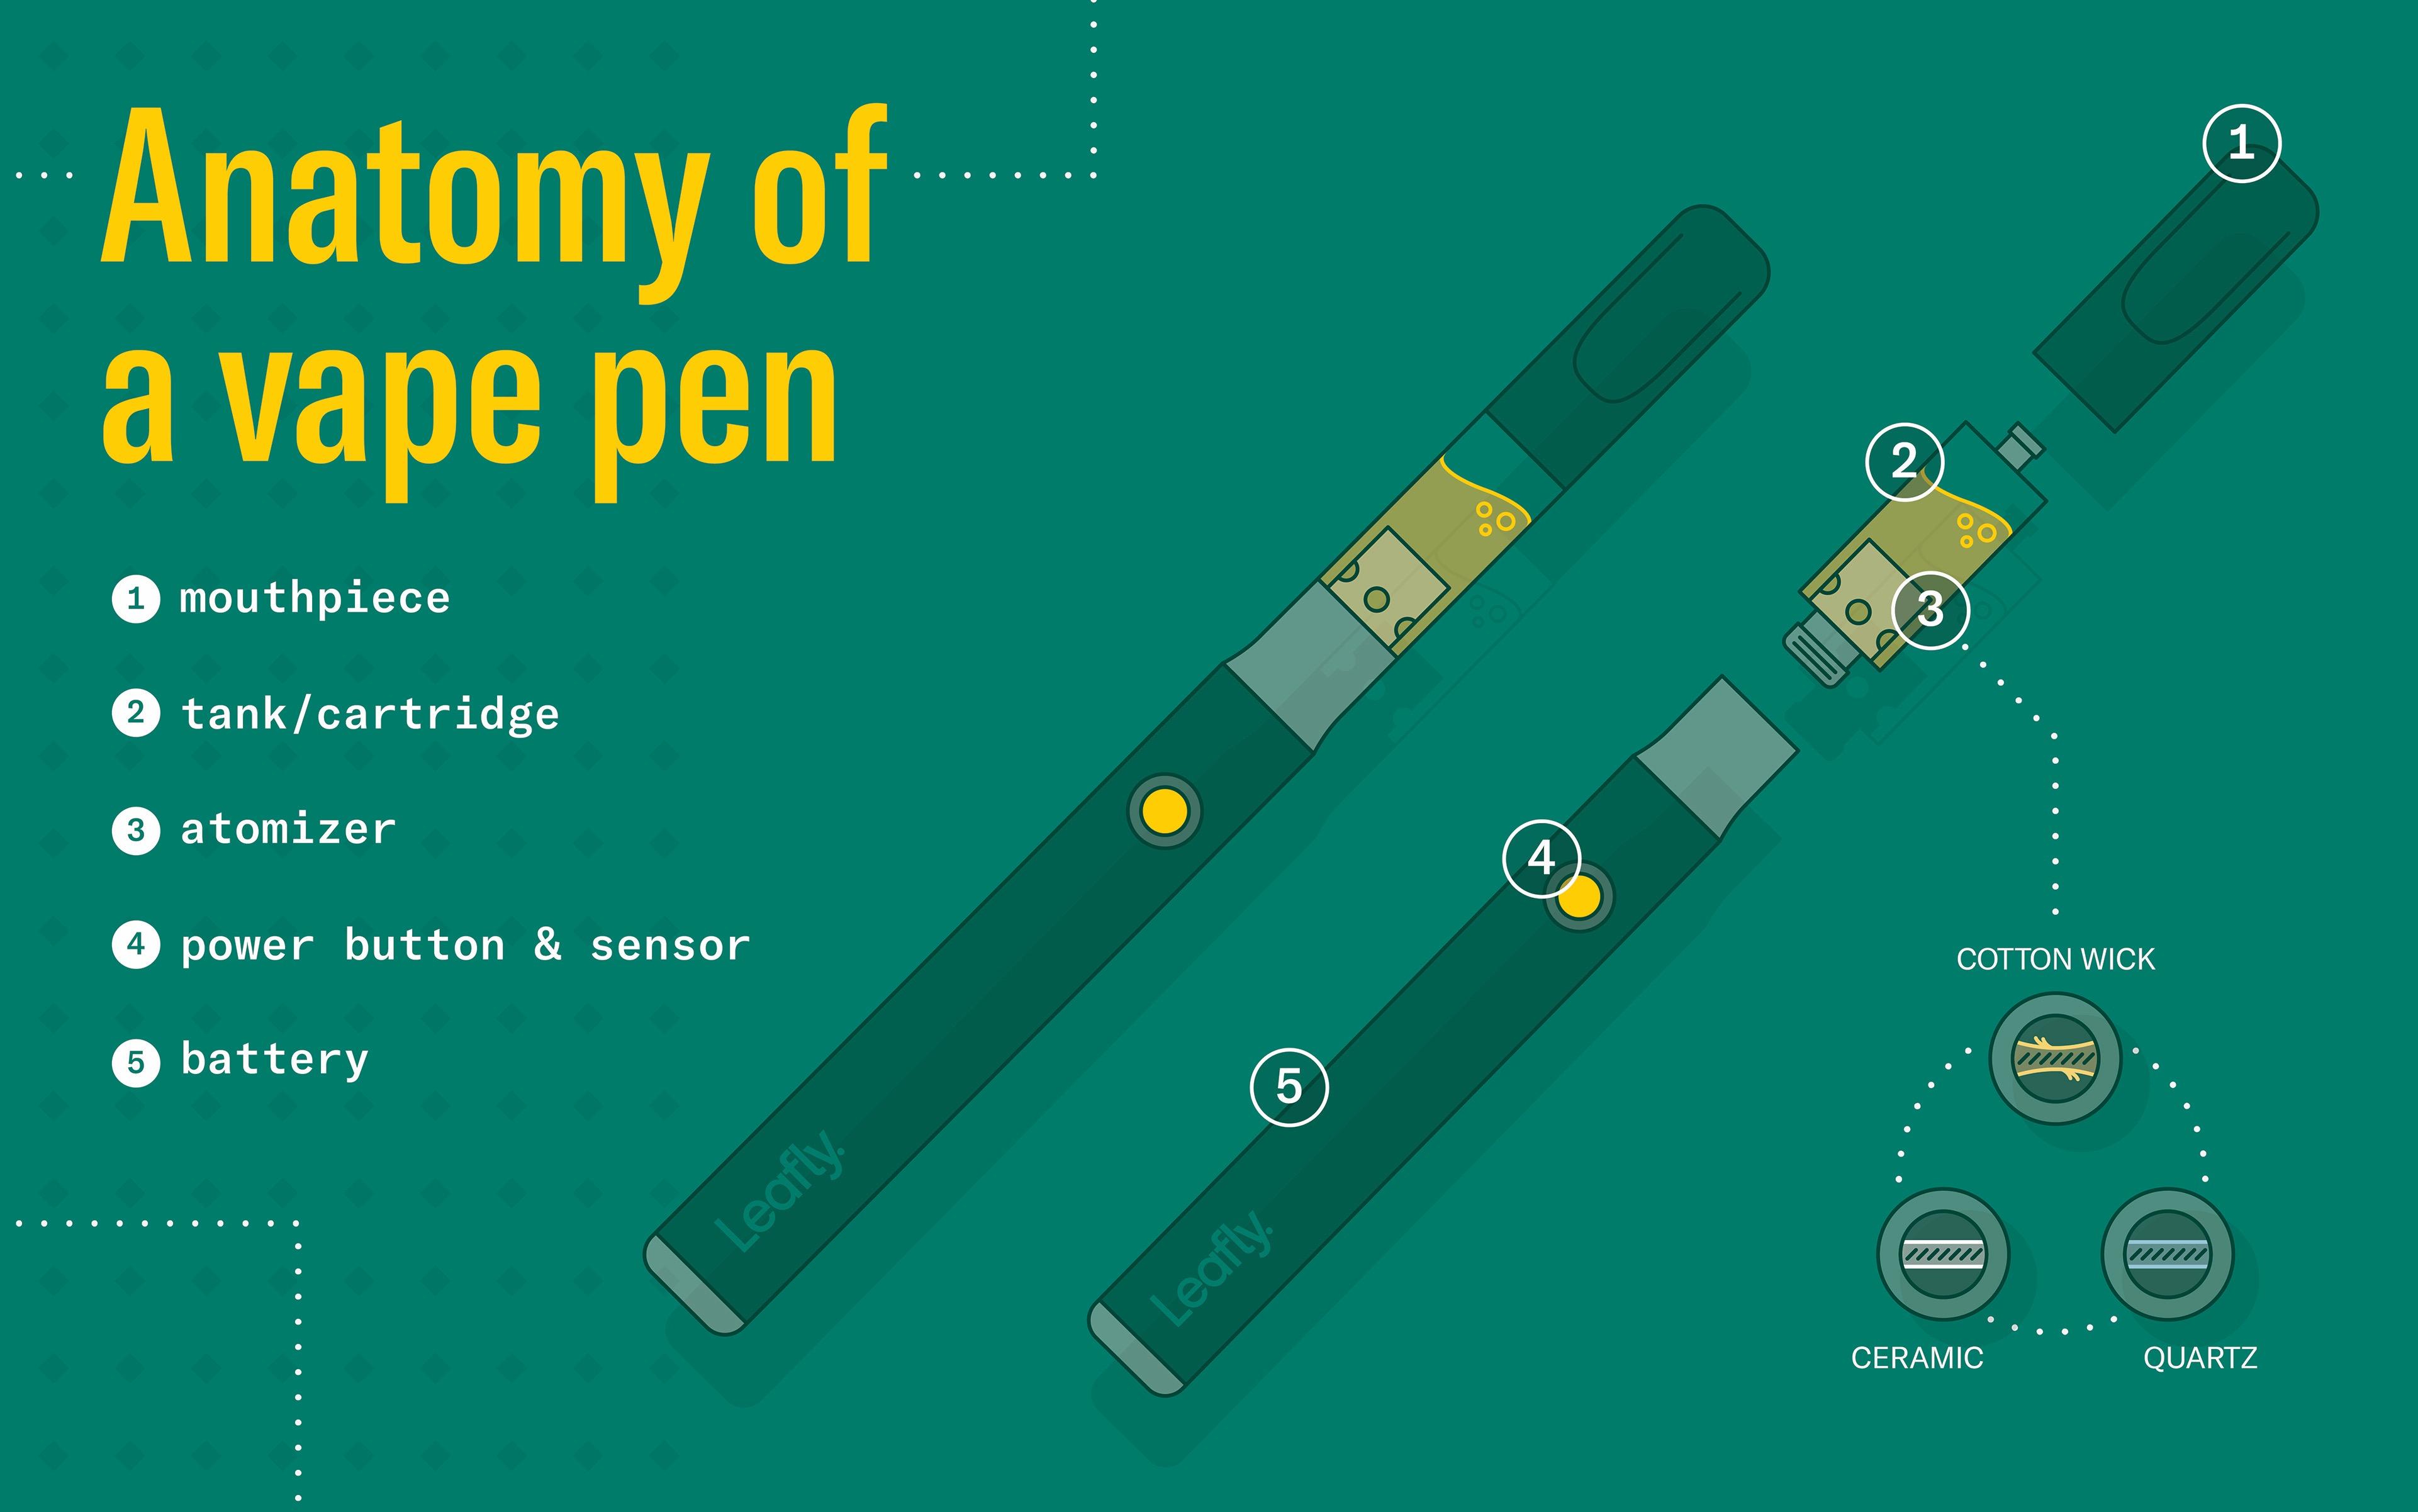 vape pen, how to